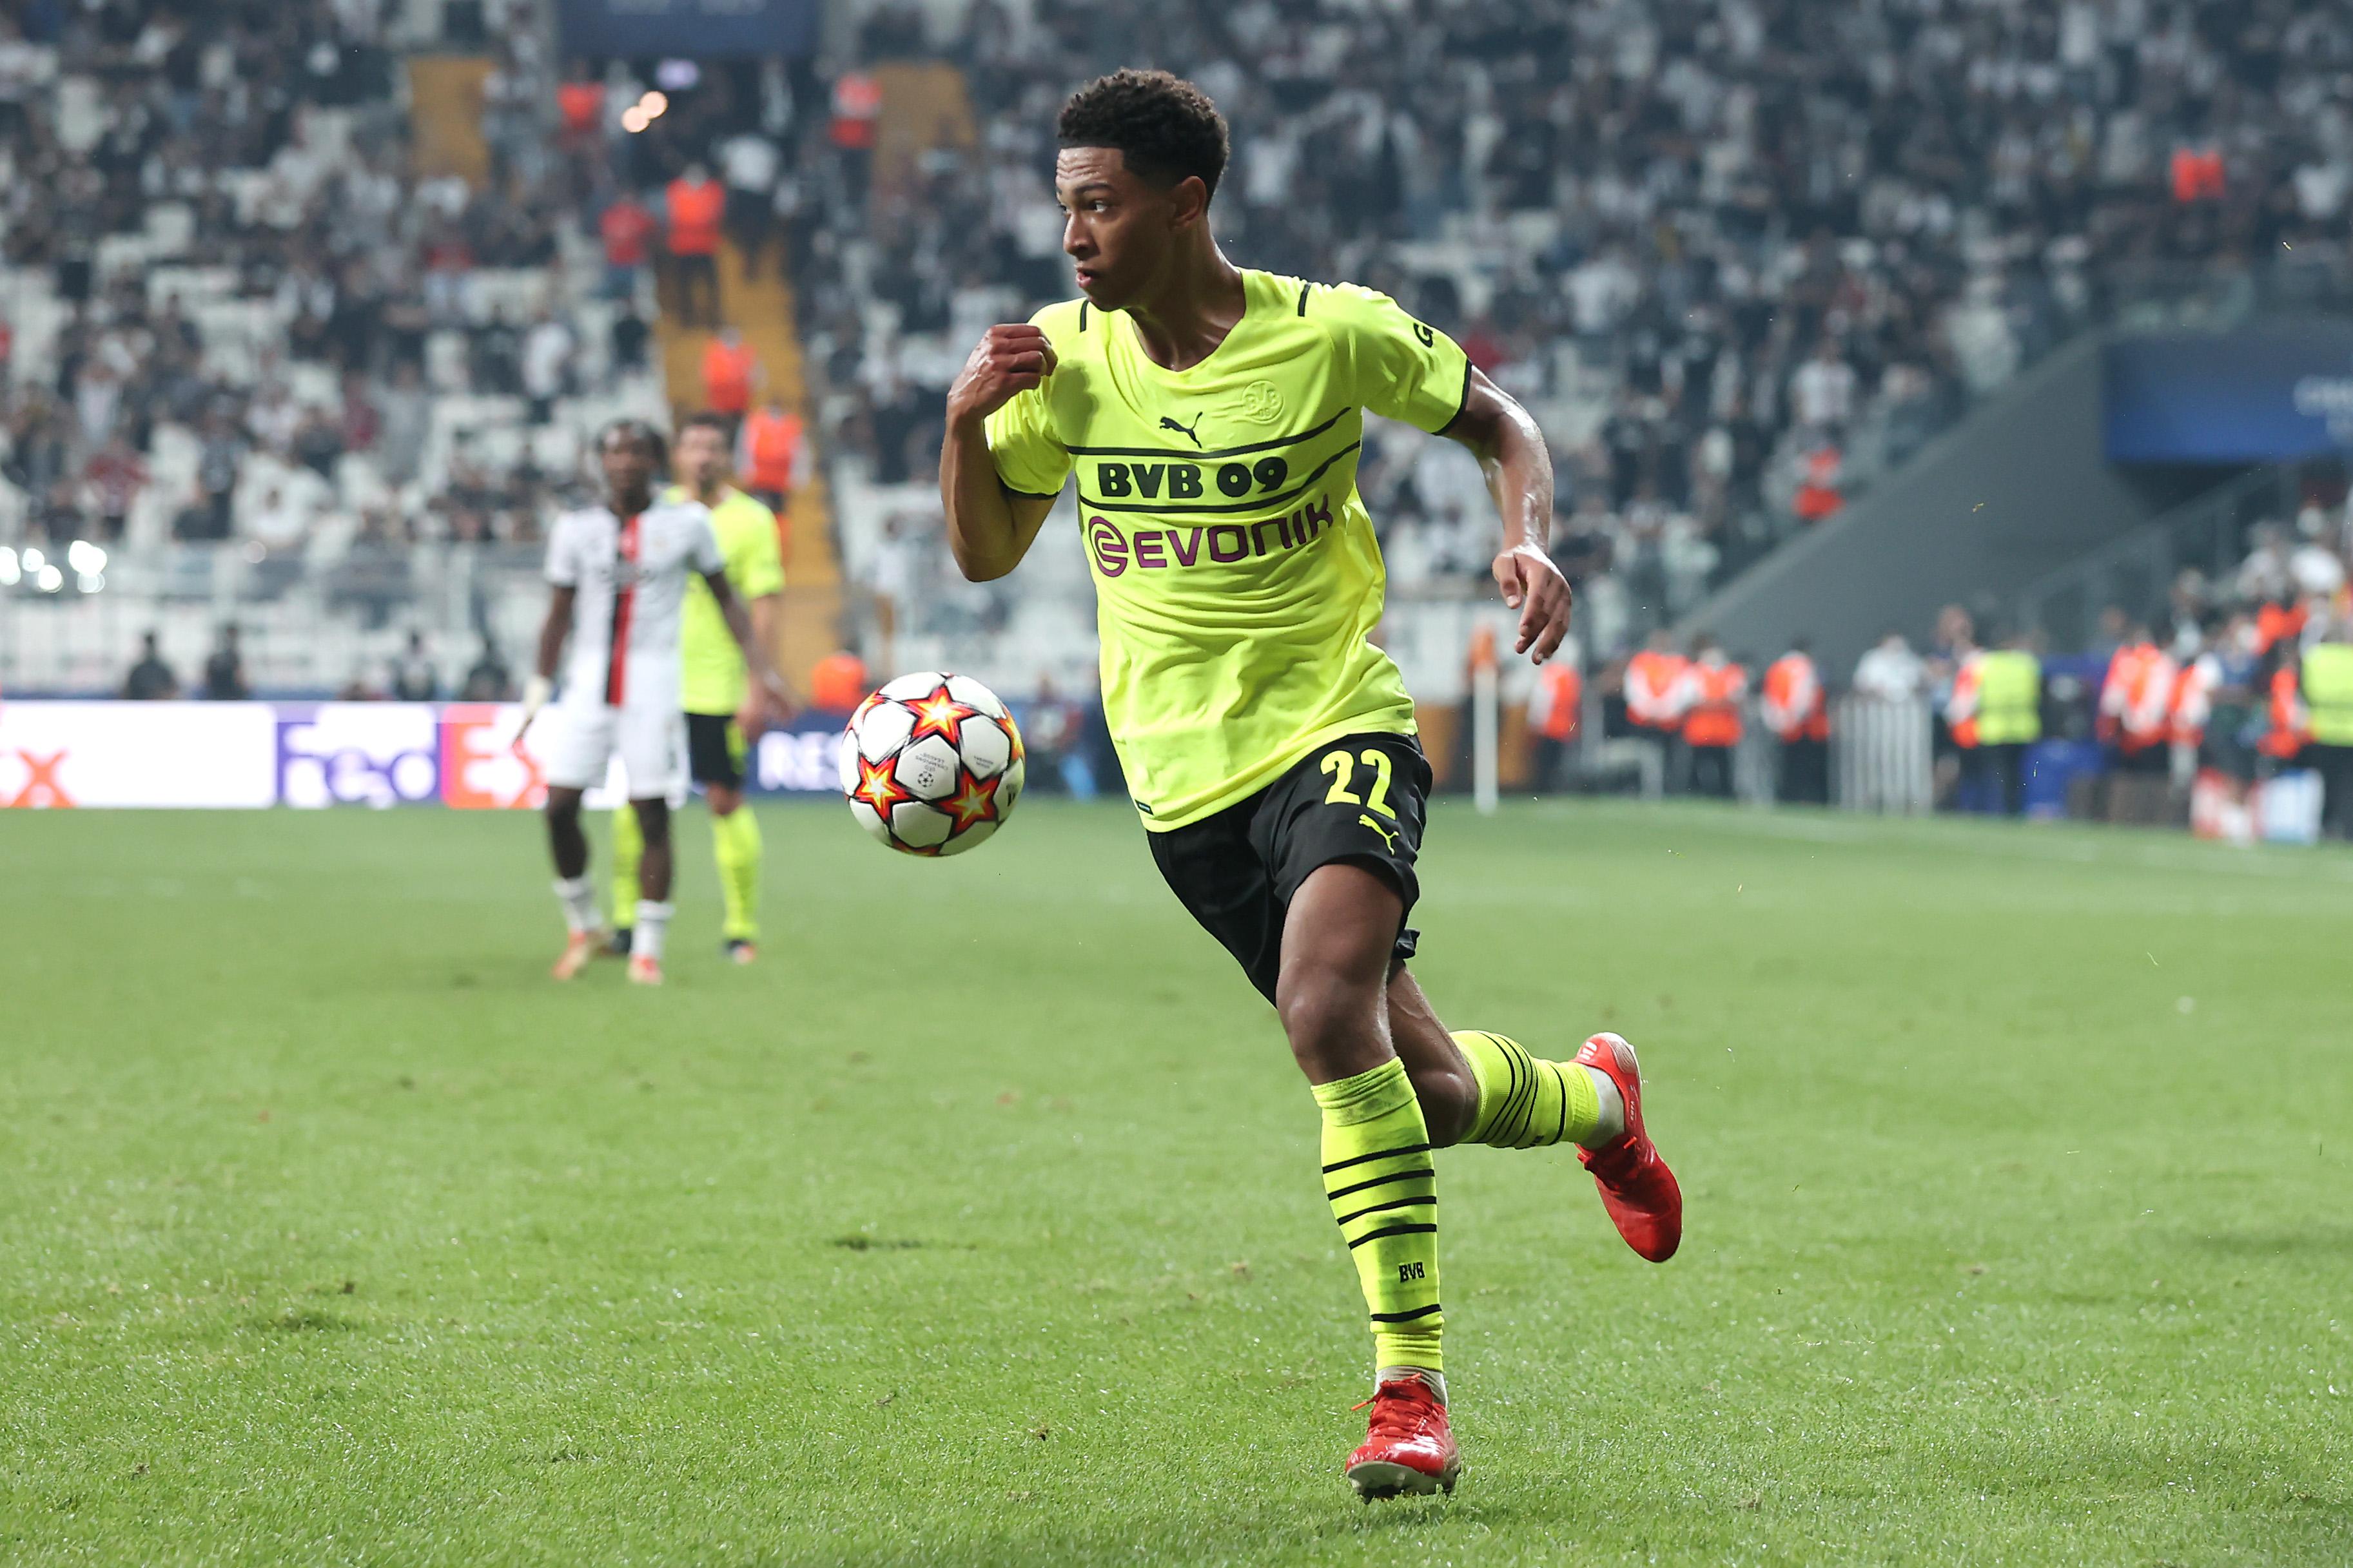 Besiktas v Borussia Dortmund: Group C - UEFA Champions League